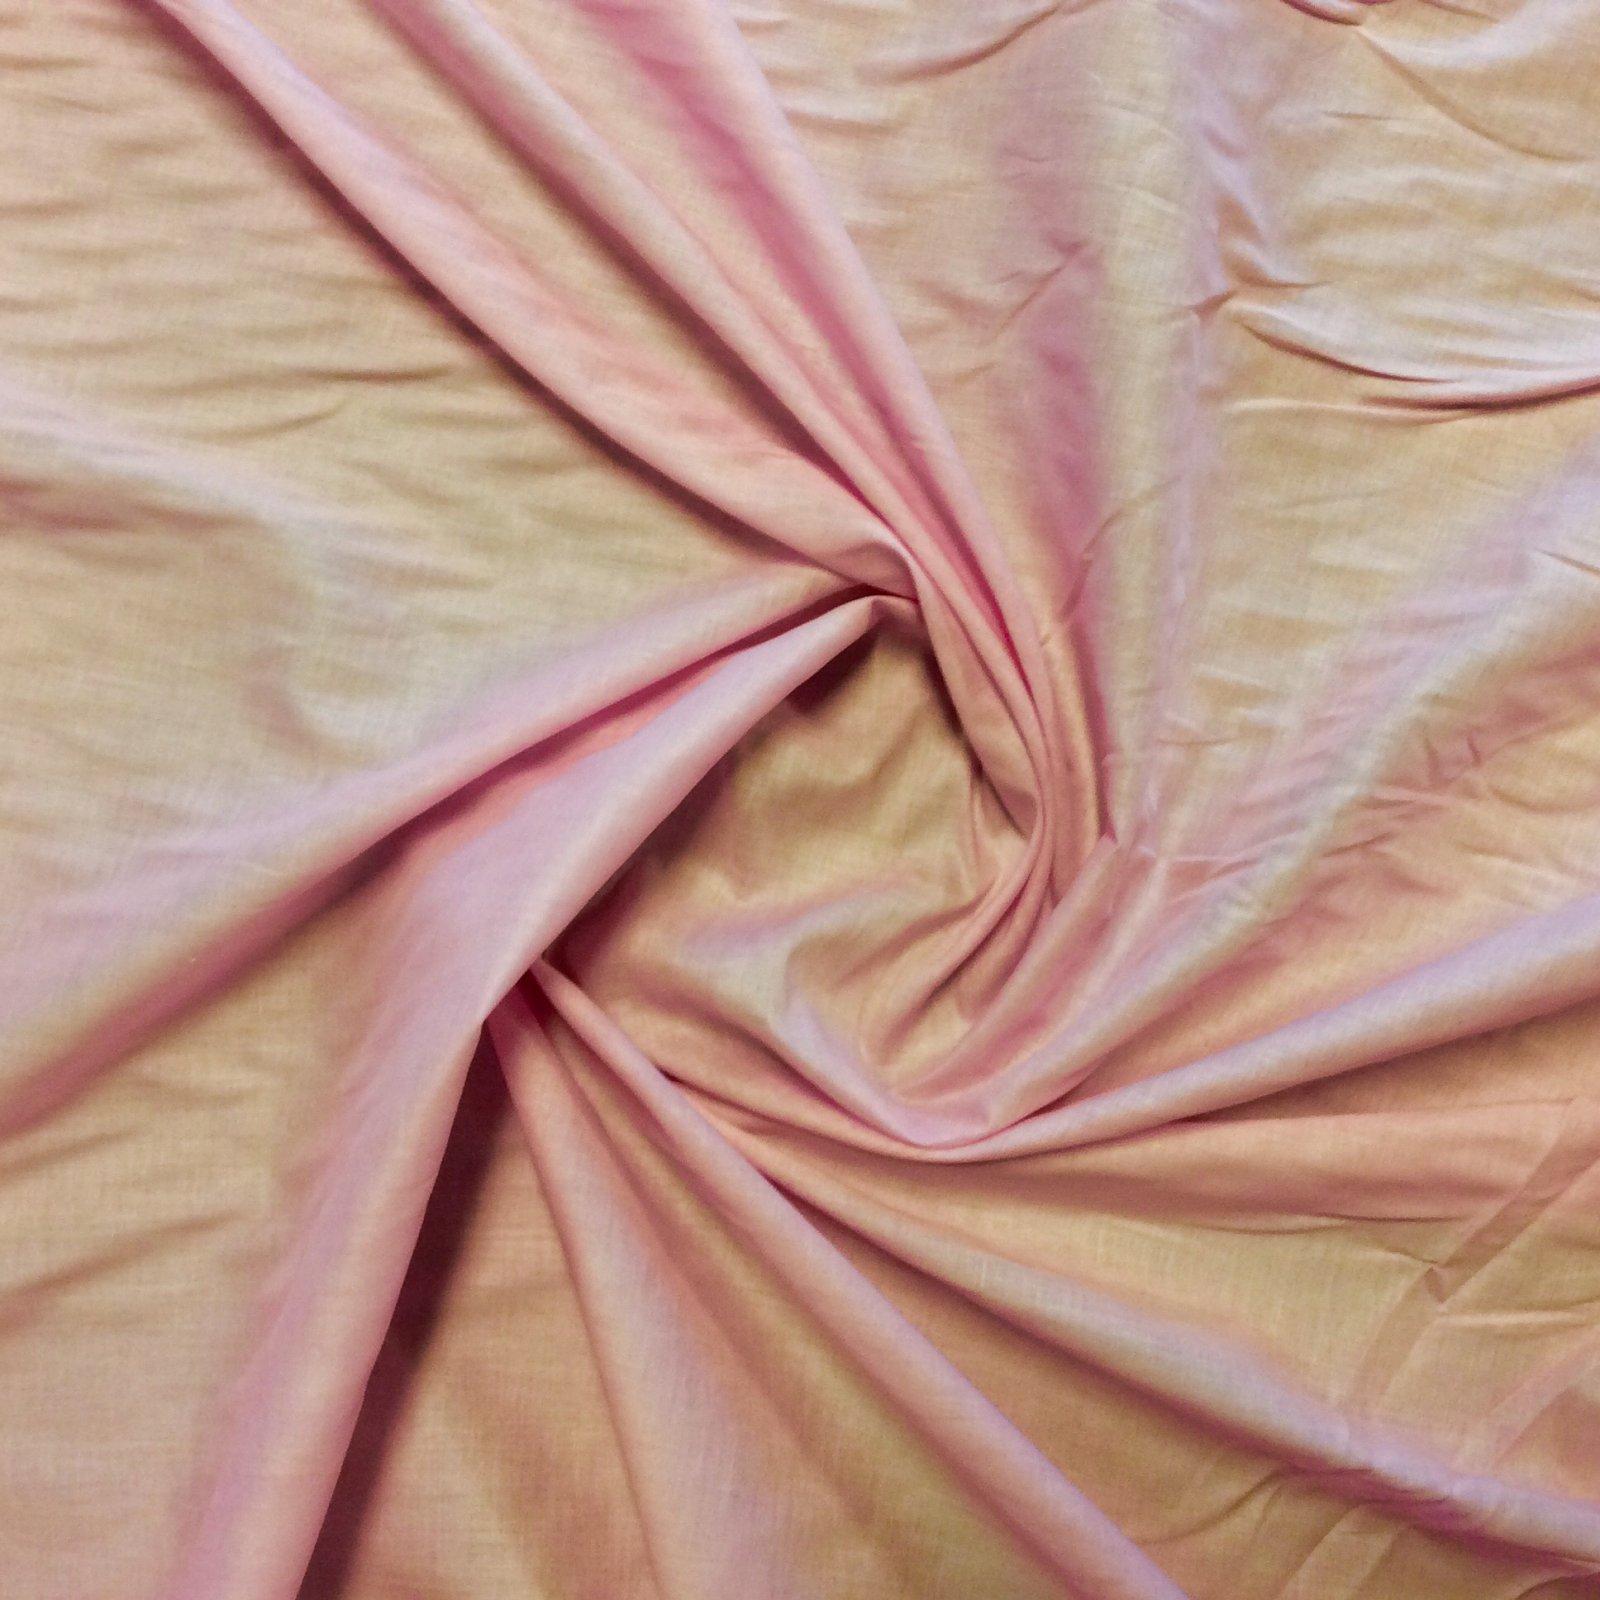 Pink Lightweight Cotton Shirting Apparel Dressmaking Fabric CC7003